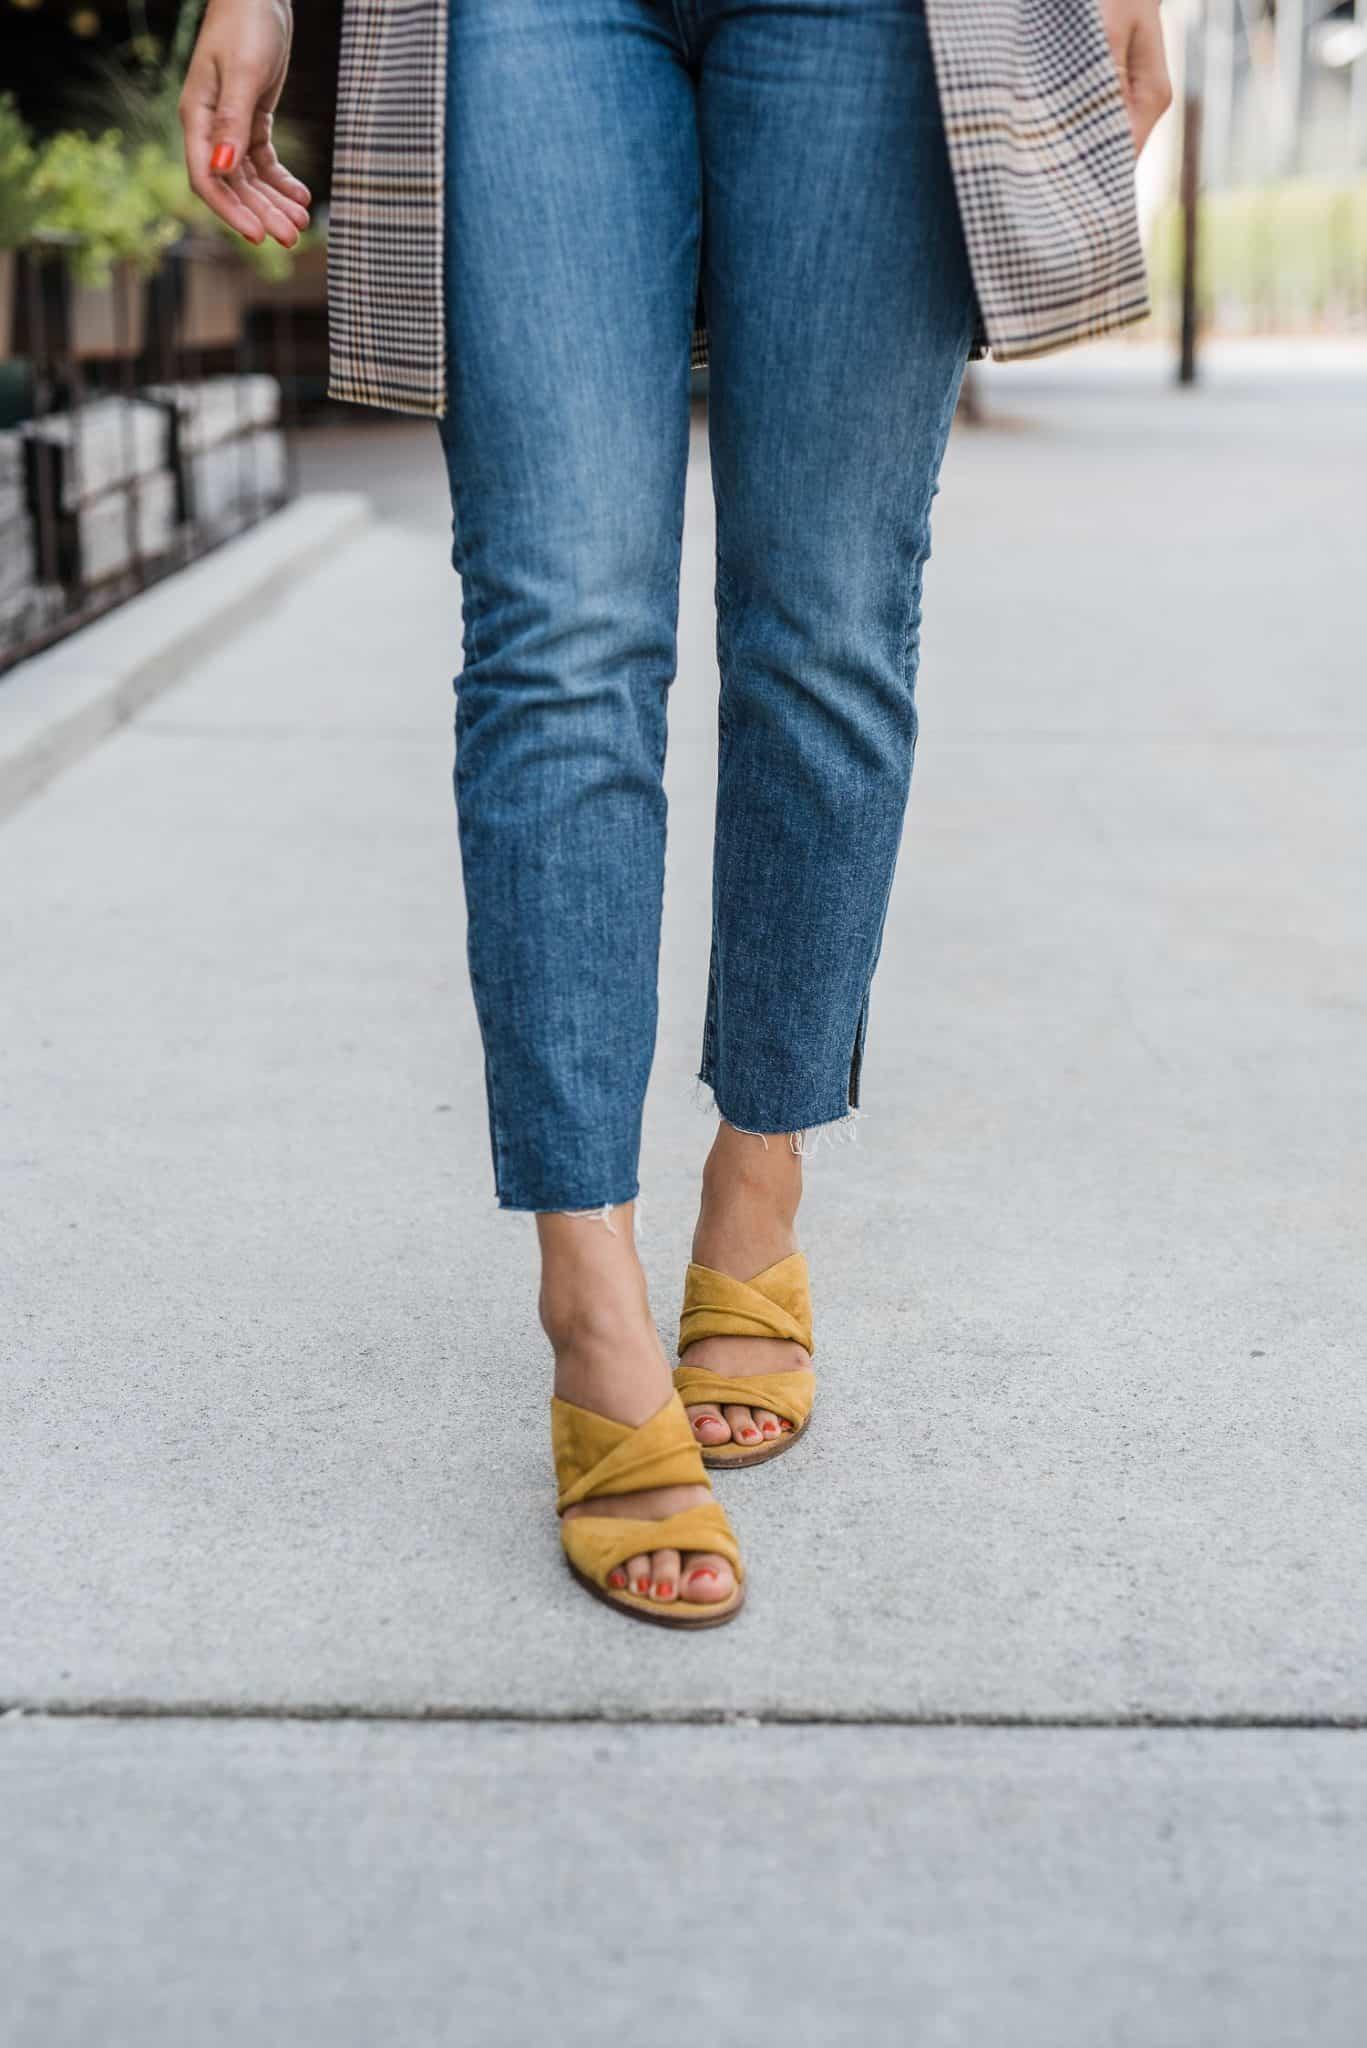 Mustard heels for the fall season